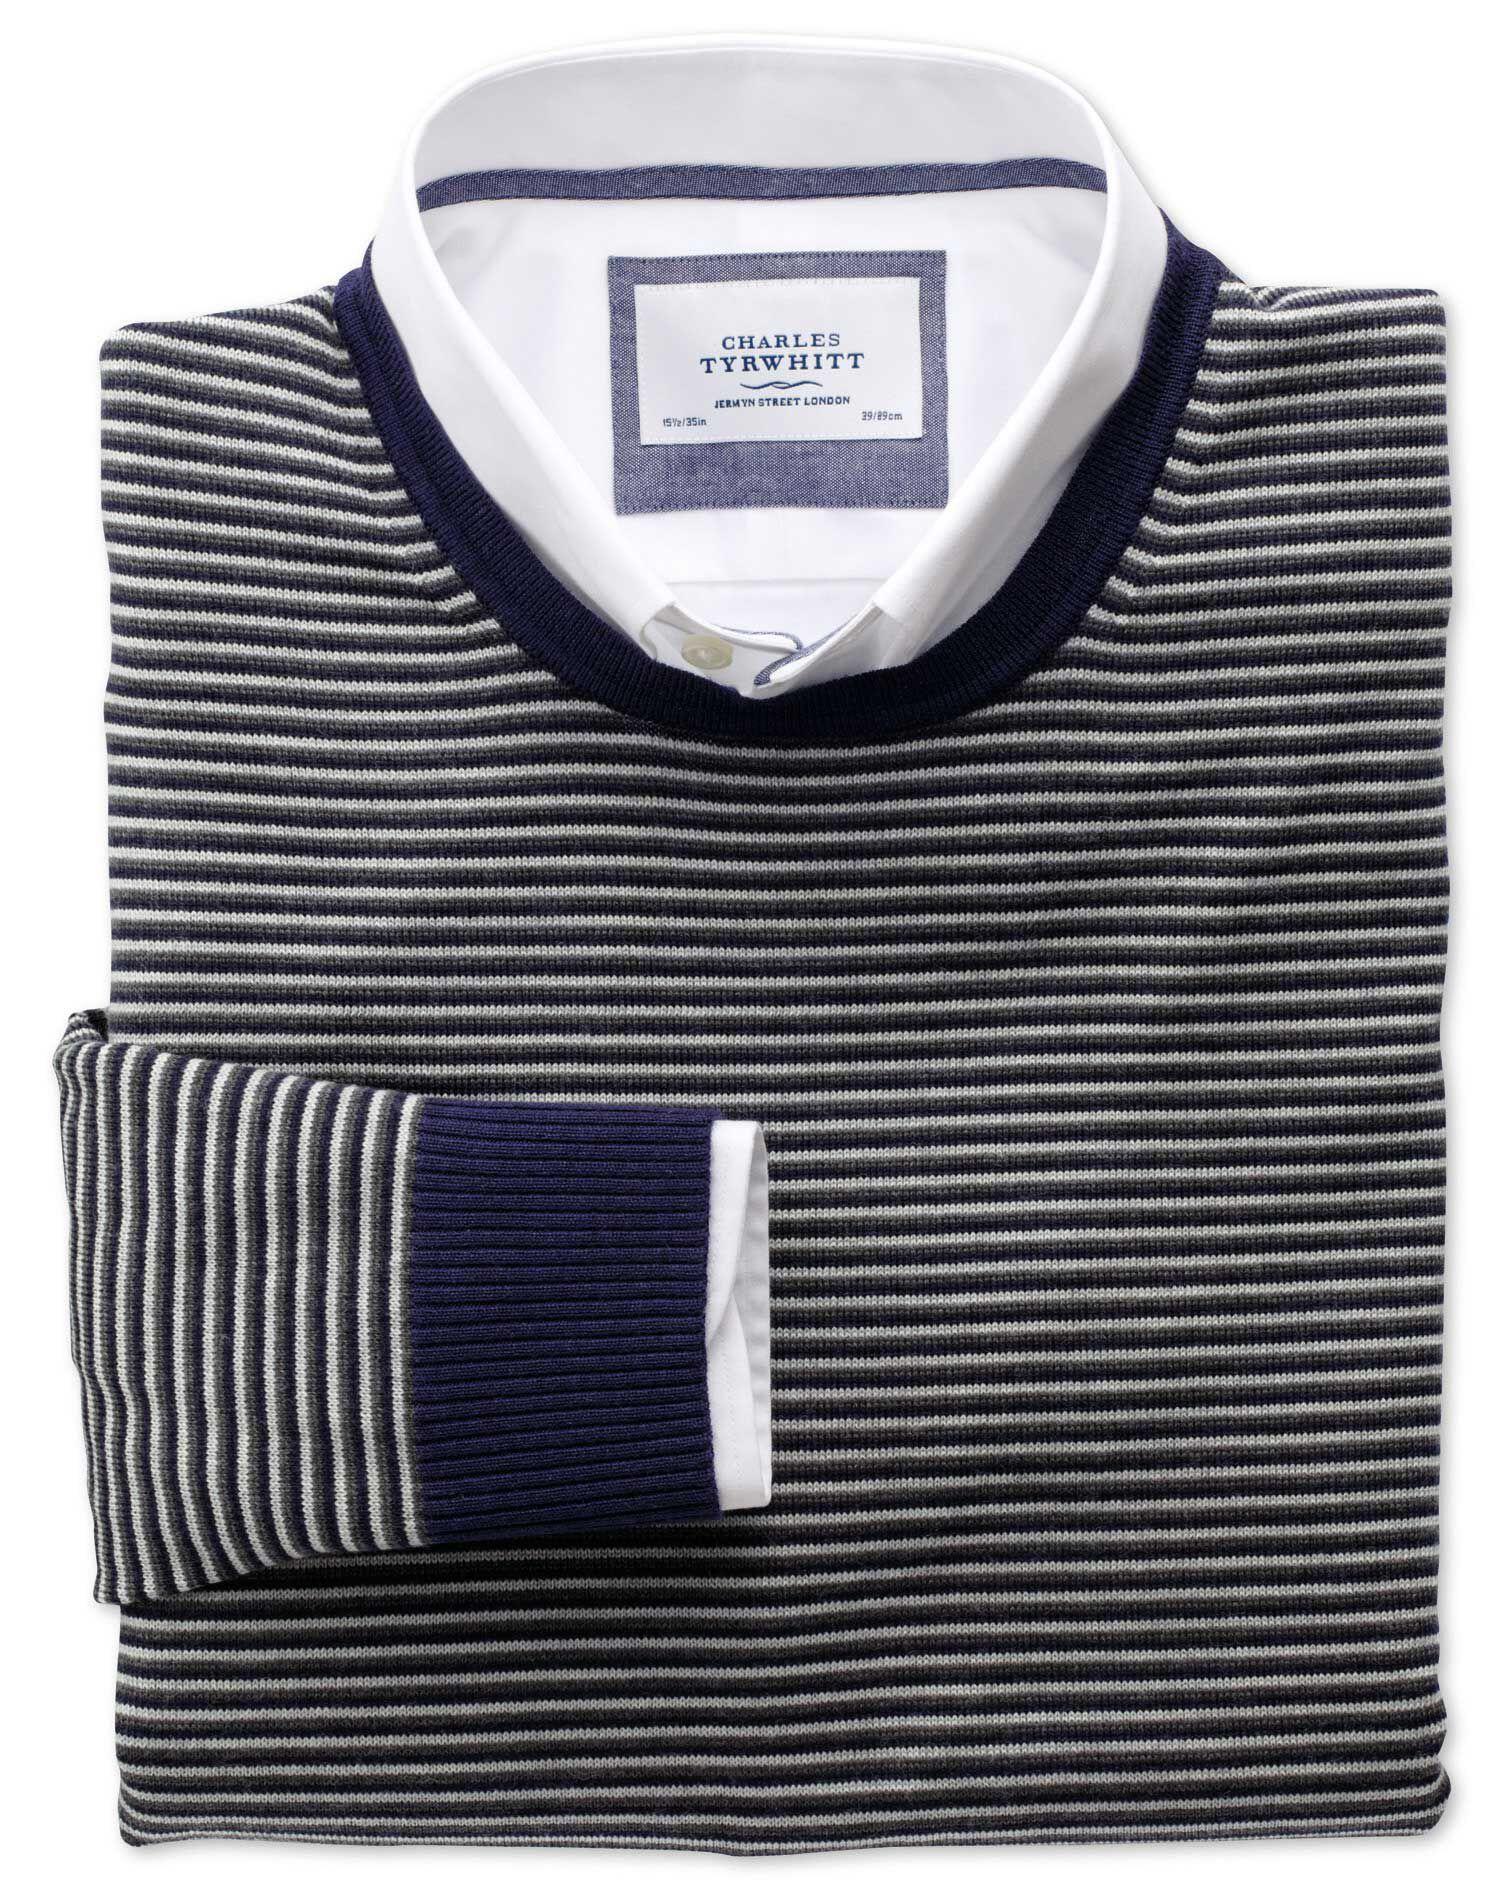 Grey and Charcoal Stripe Merino Wool Crew Neck Jumper Size XXL by Charles Tyrwhitt